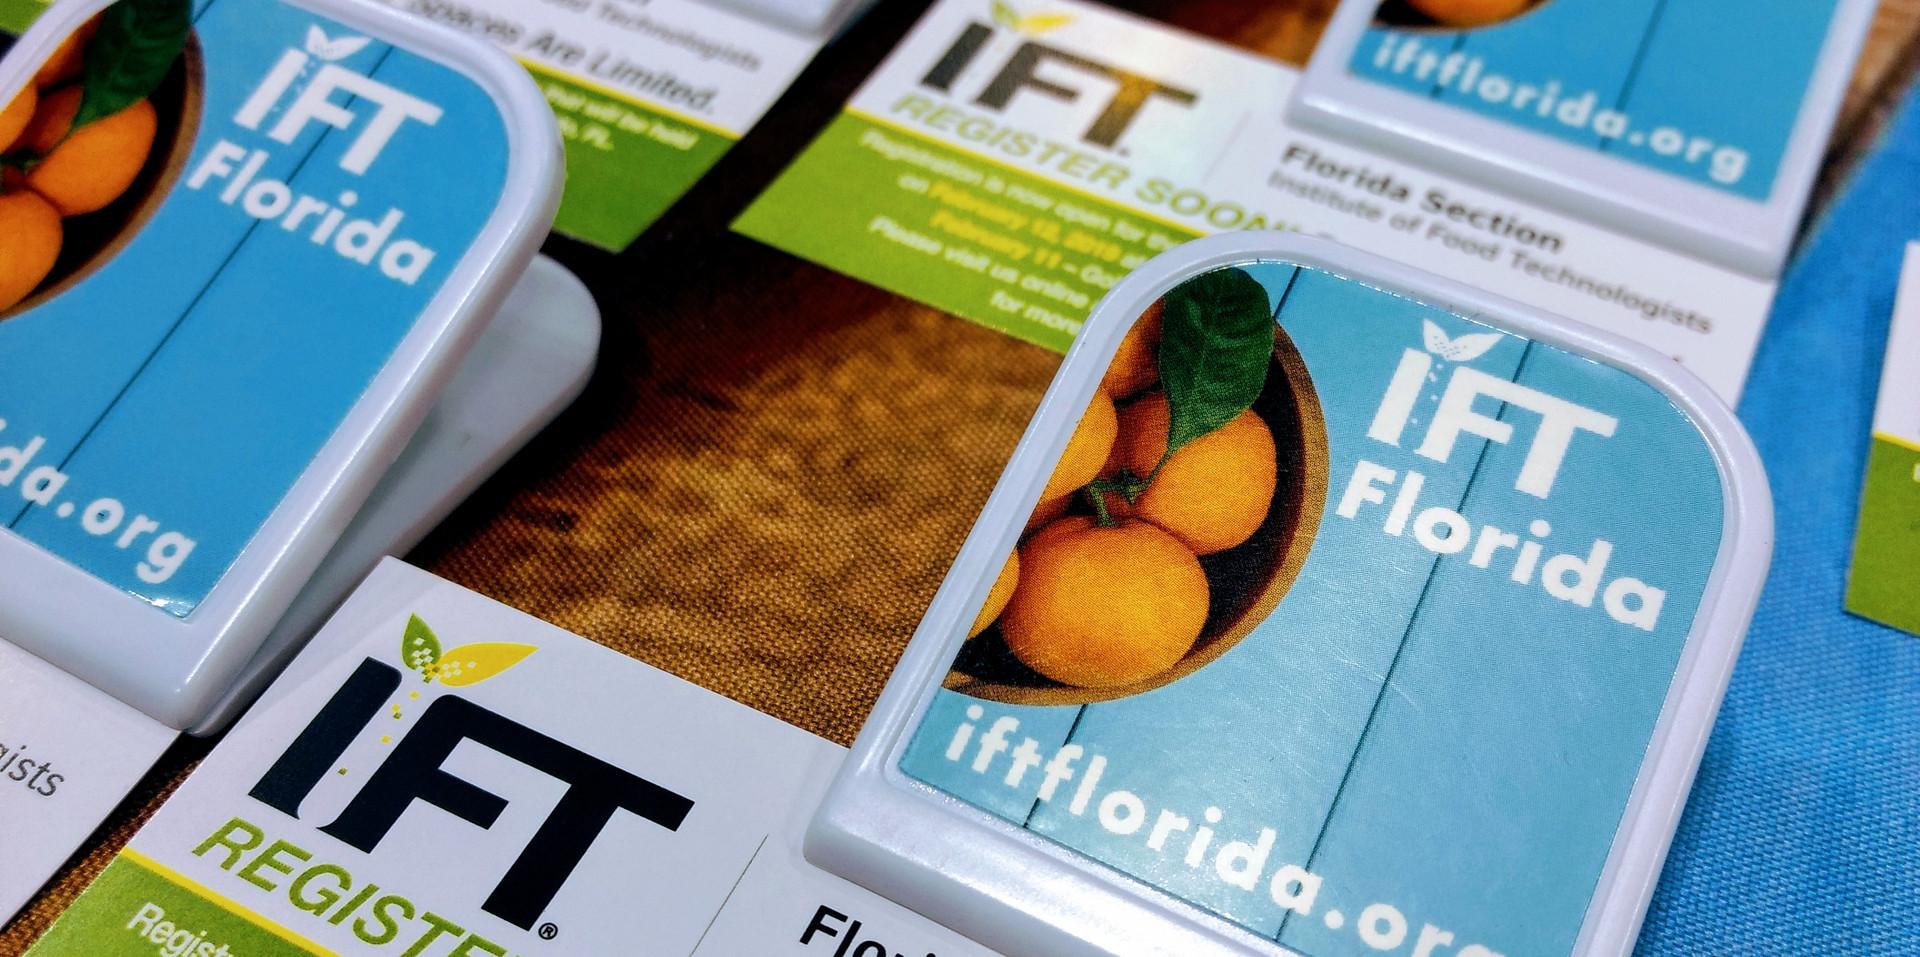 IFT Florida Events